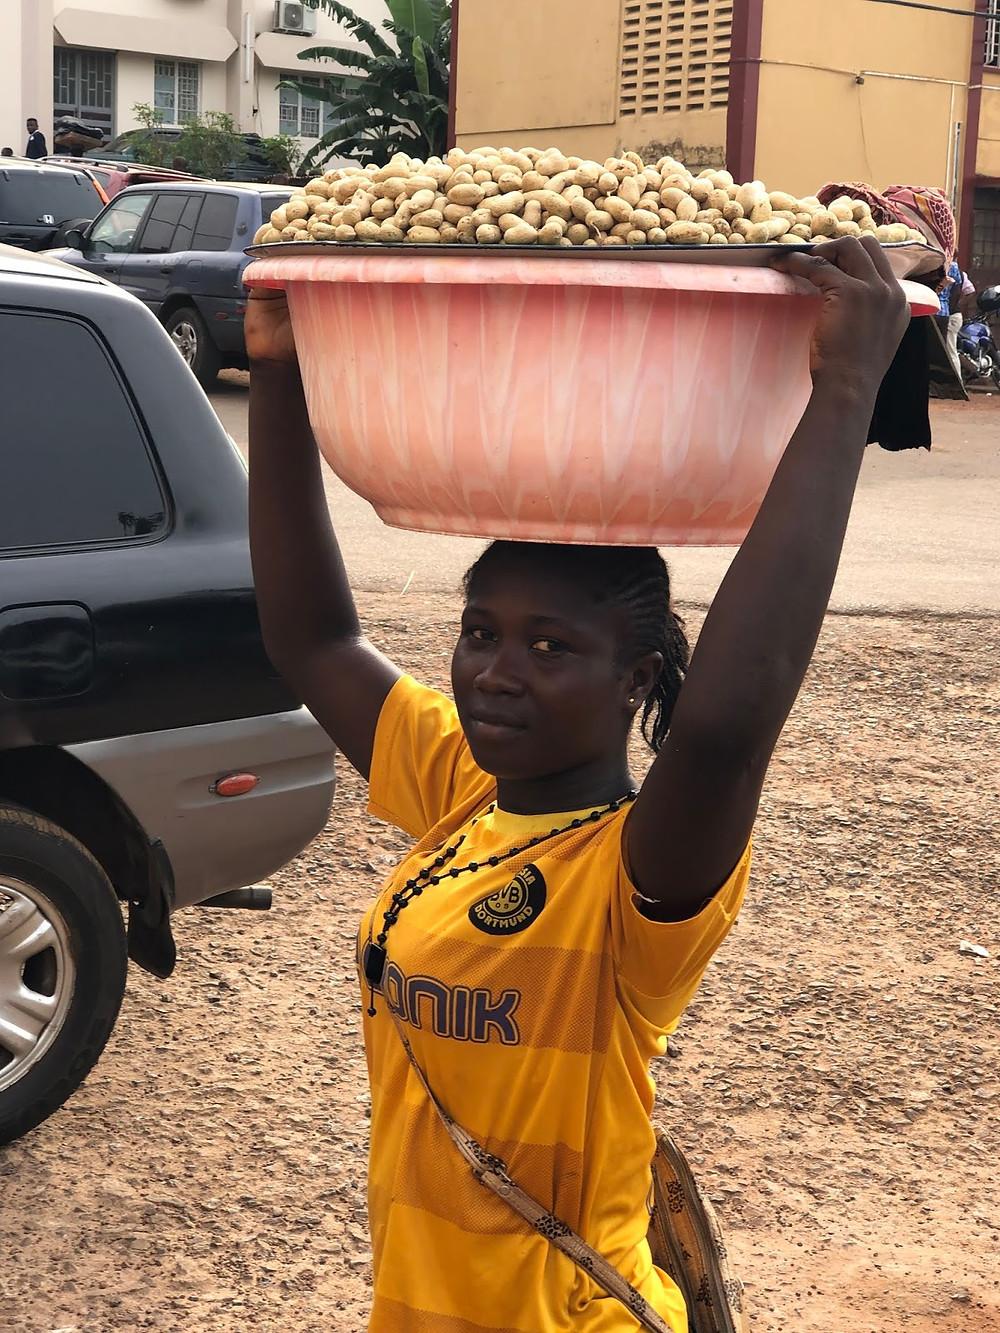 Aminatta at work - selling groundnuts for peanuts